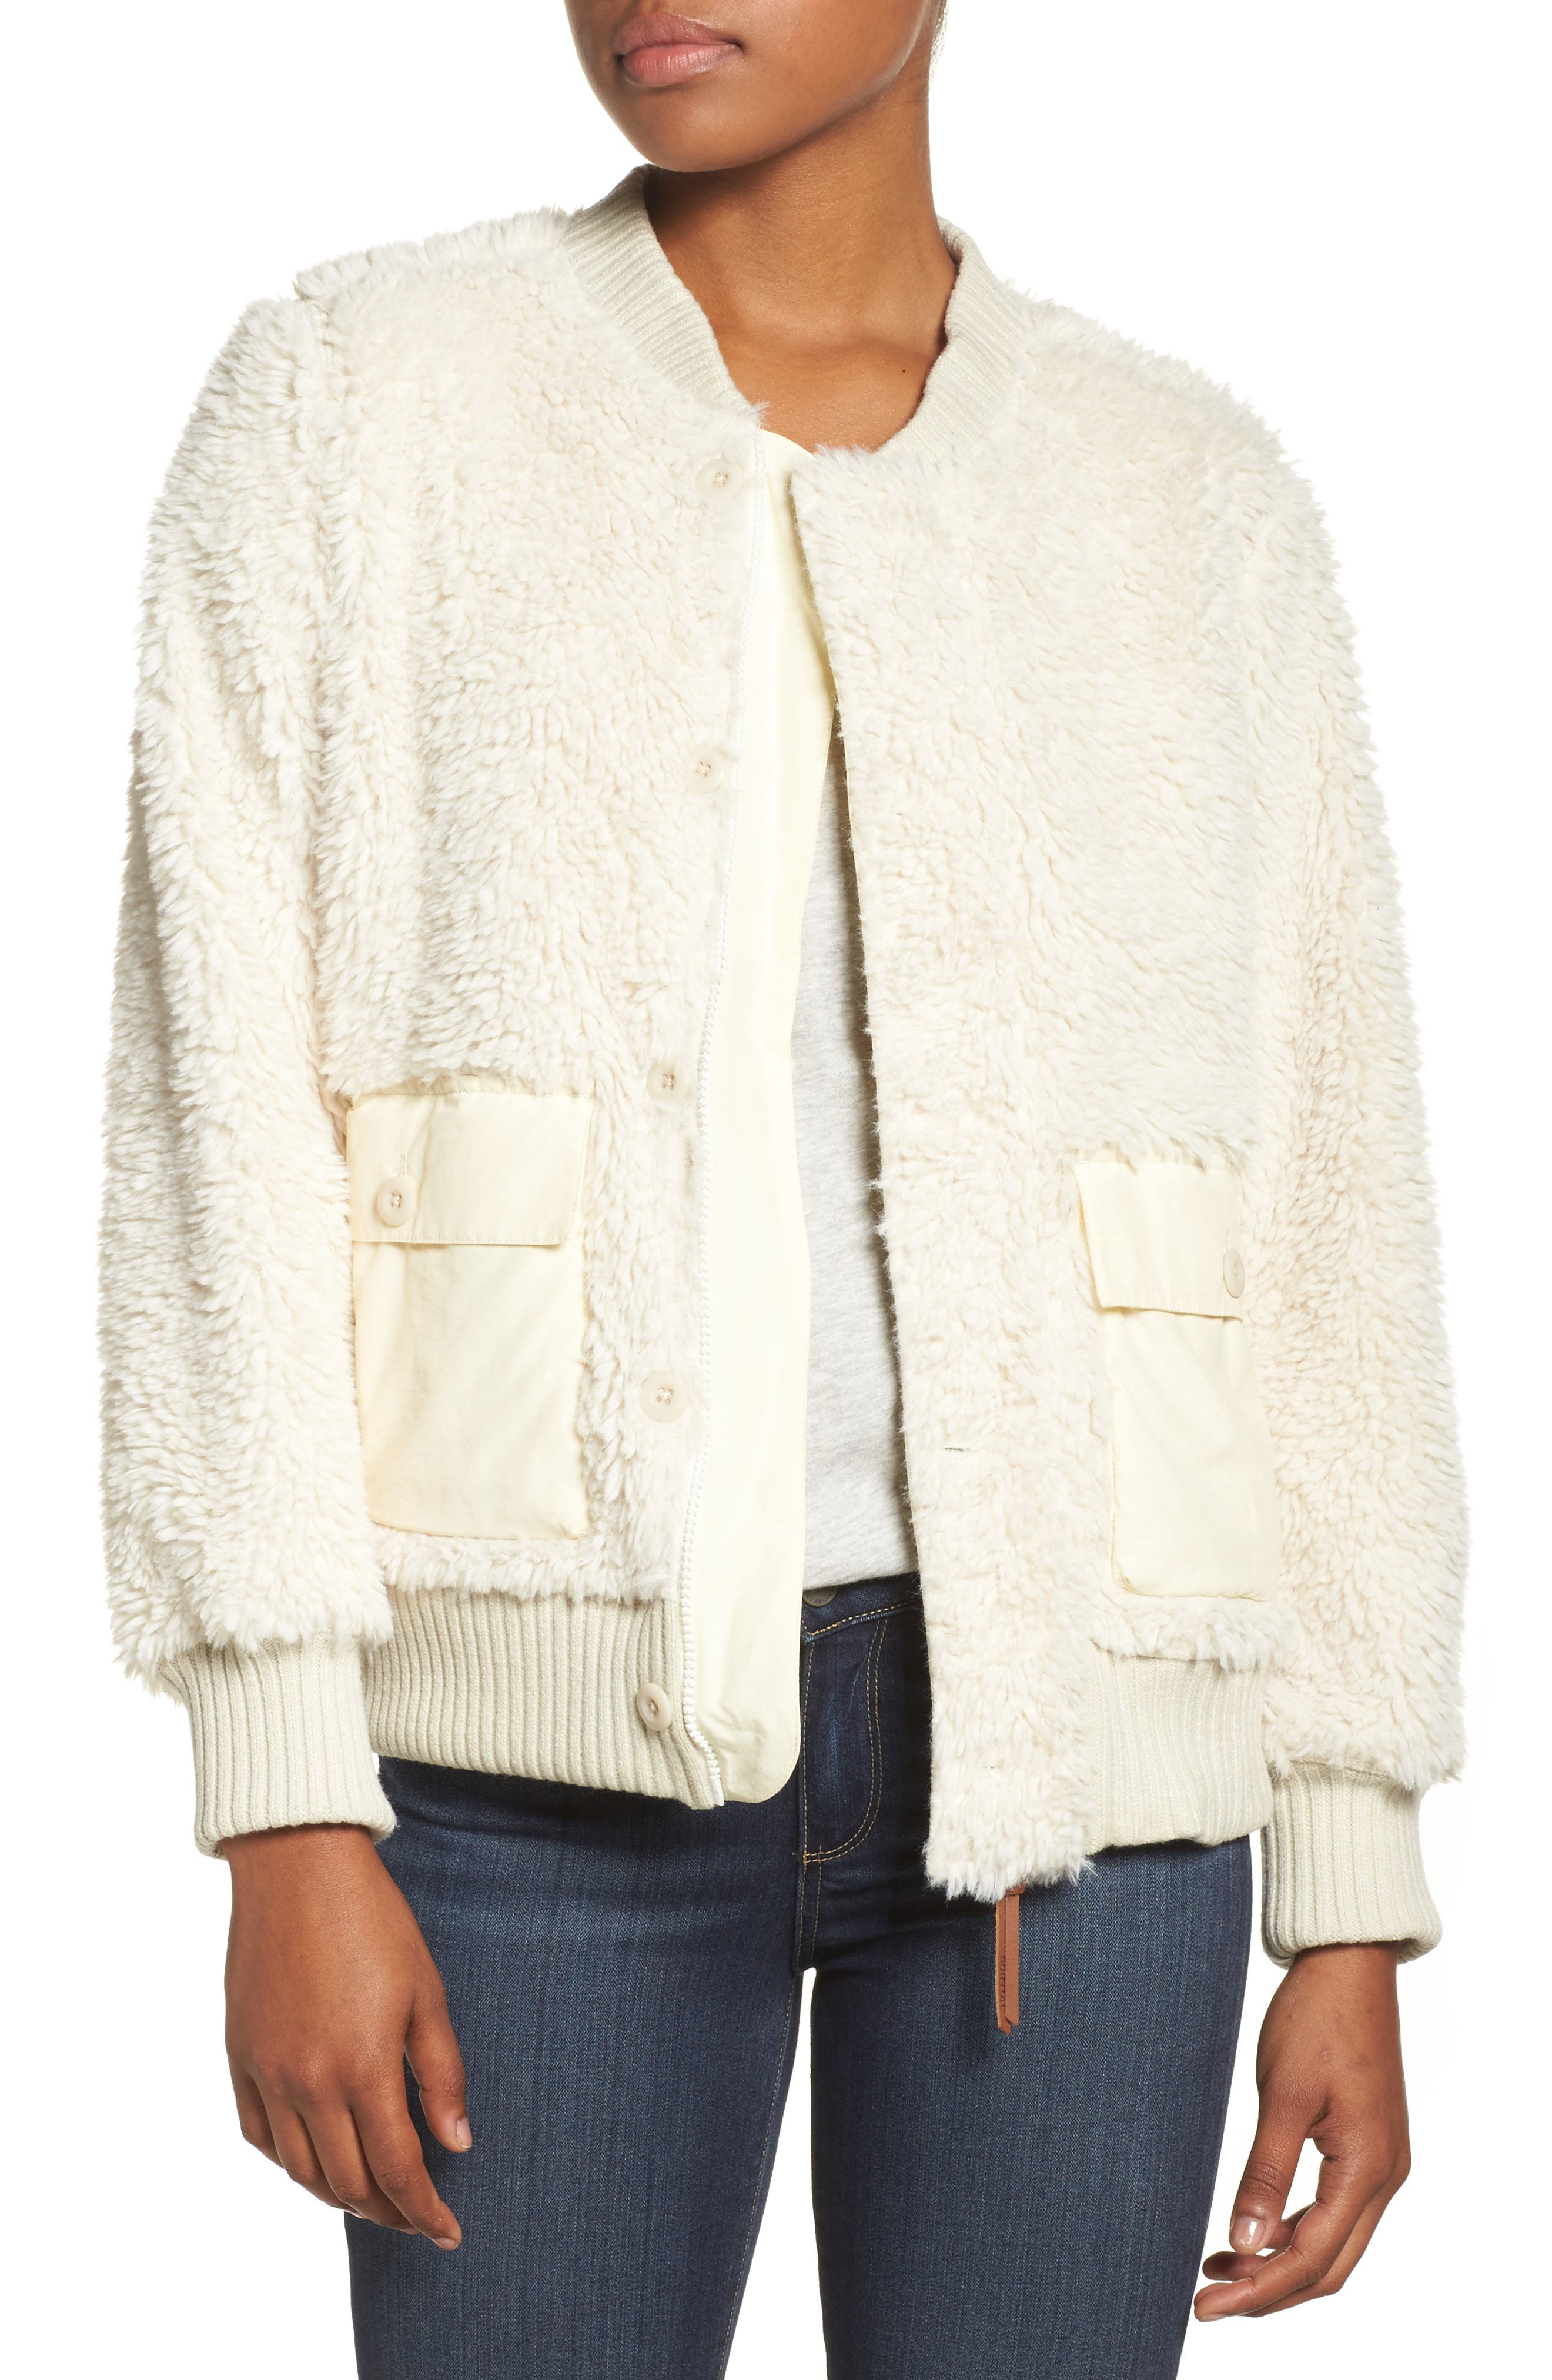 Shawmut High Pile DRYRIDE Thermex Fleece Jacket, Main, color, 100